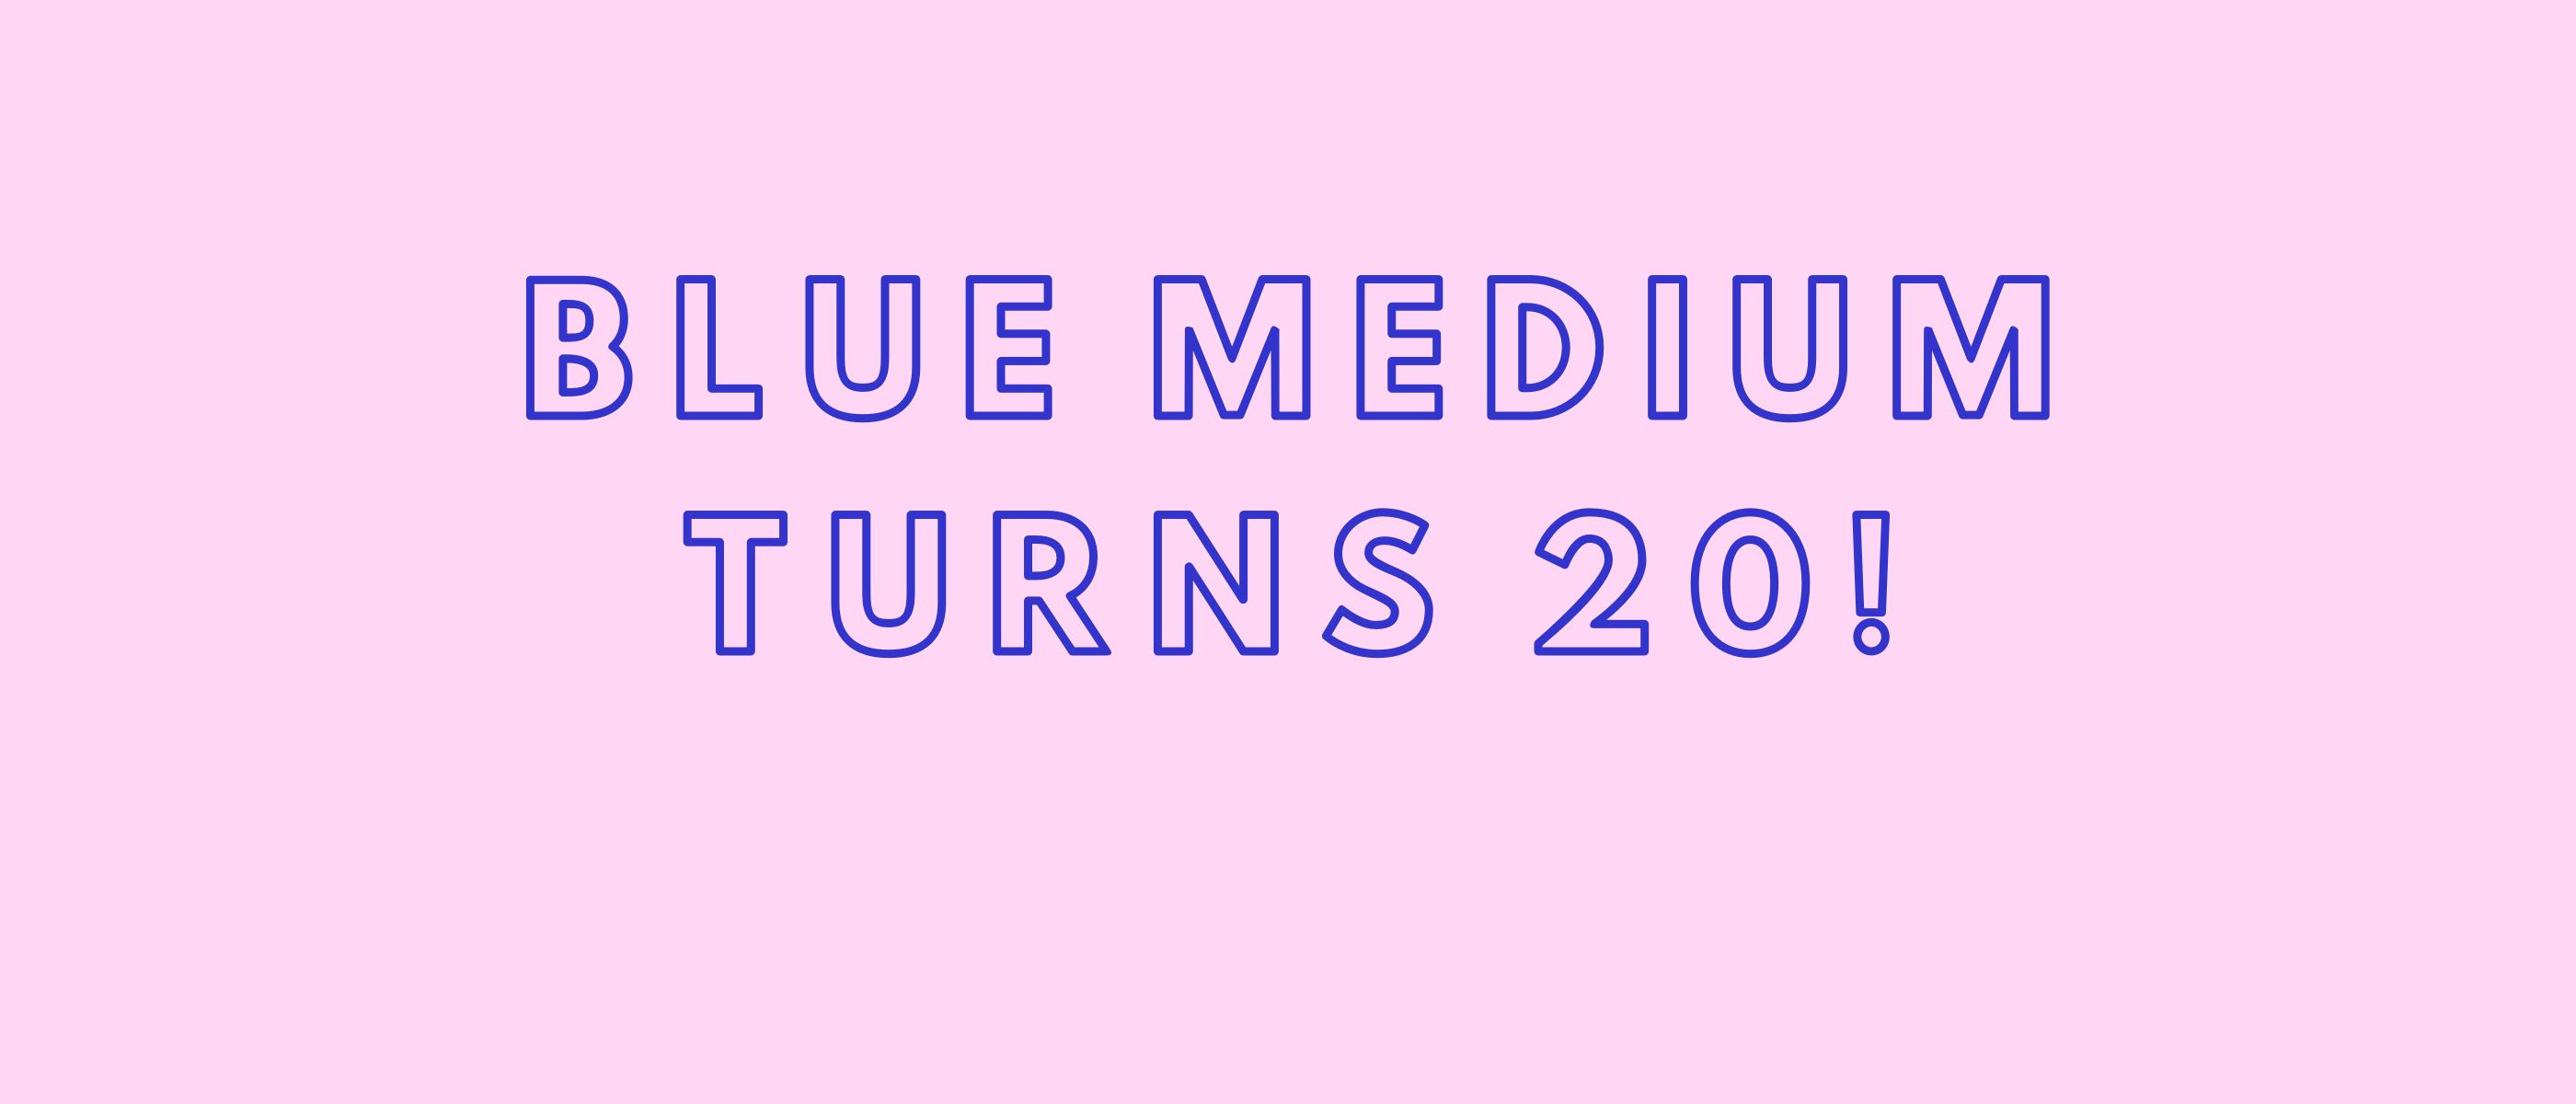 #bluemedium20